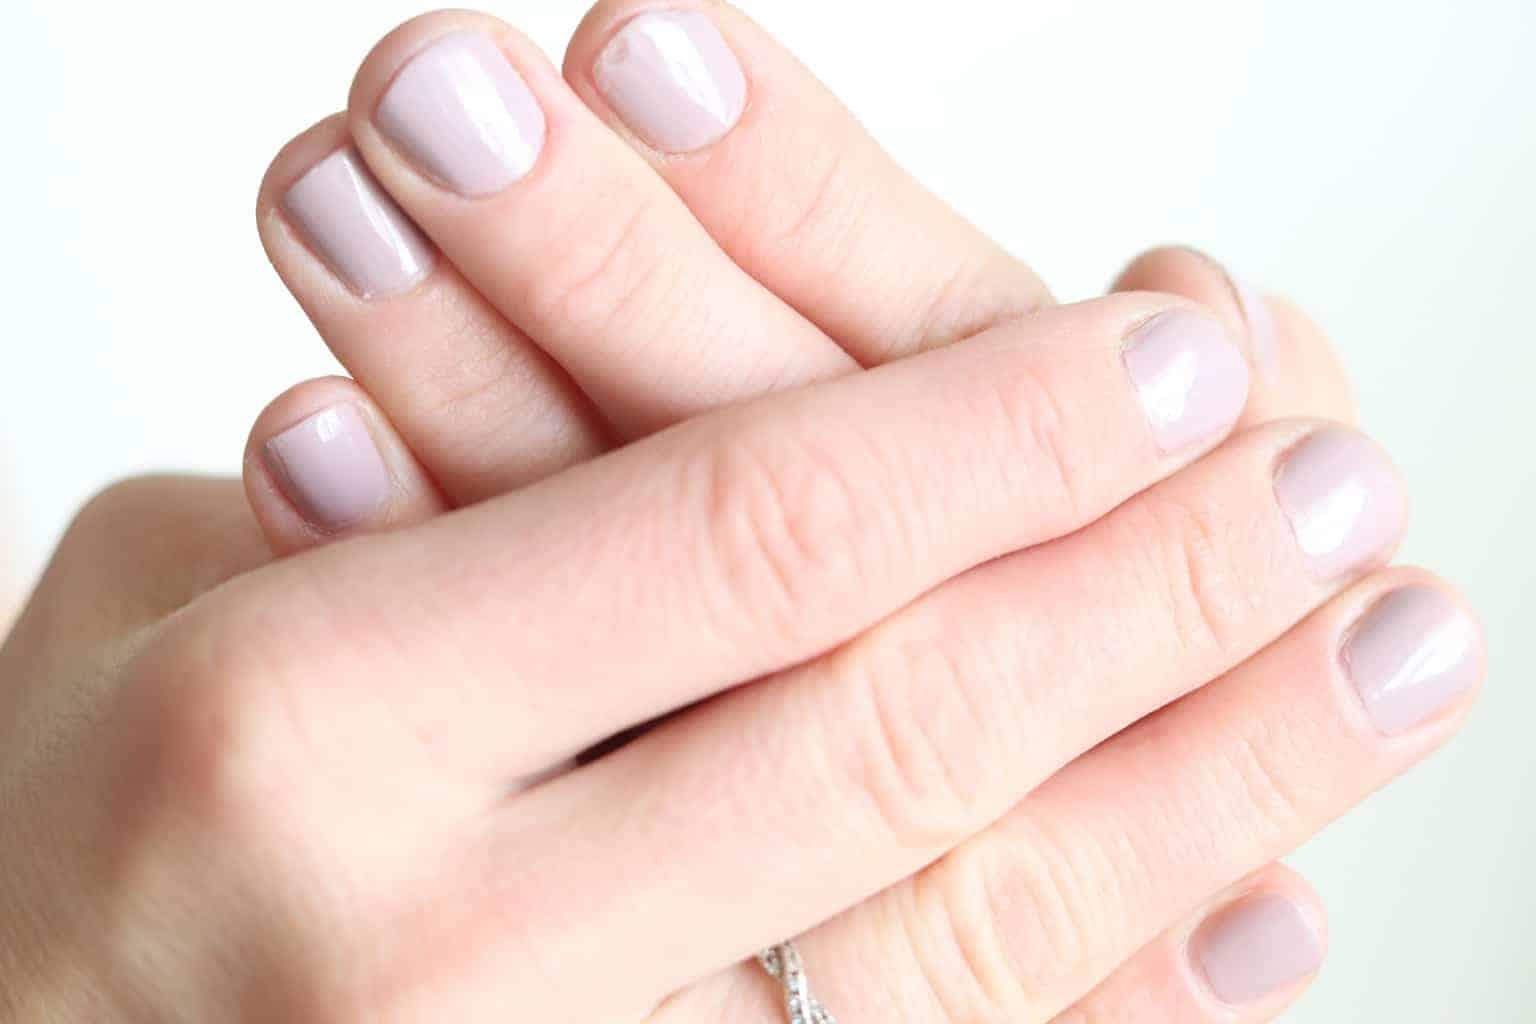 Lewomen hands with light pink painted fingernails